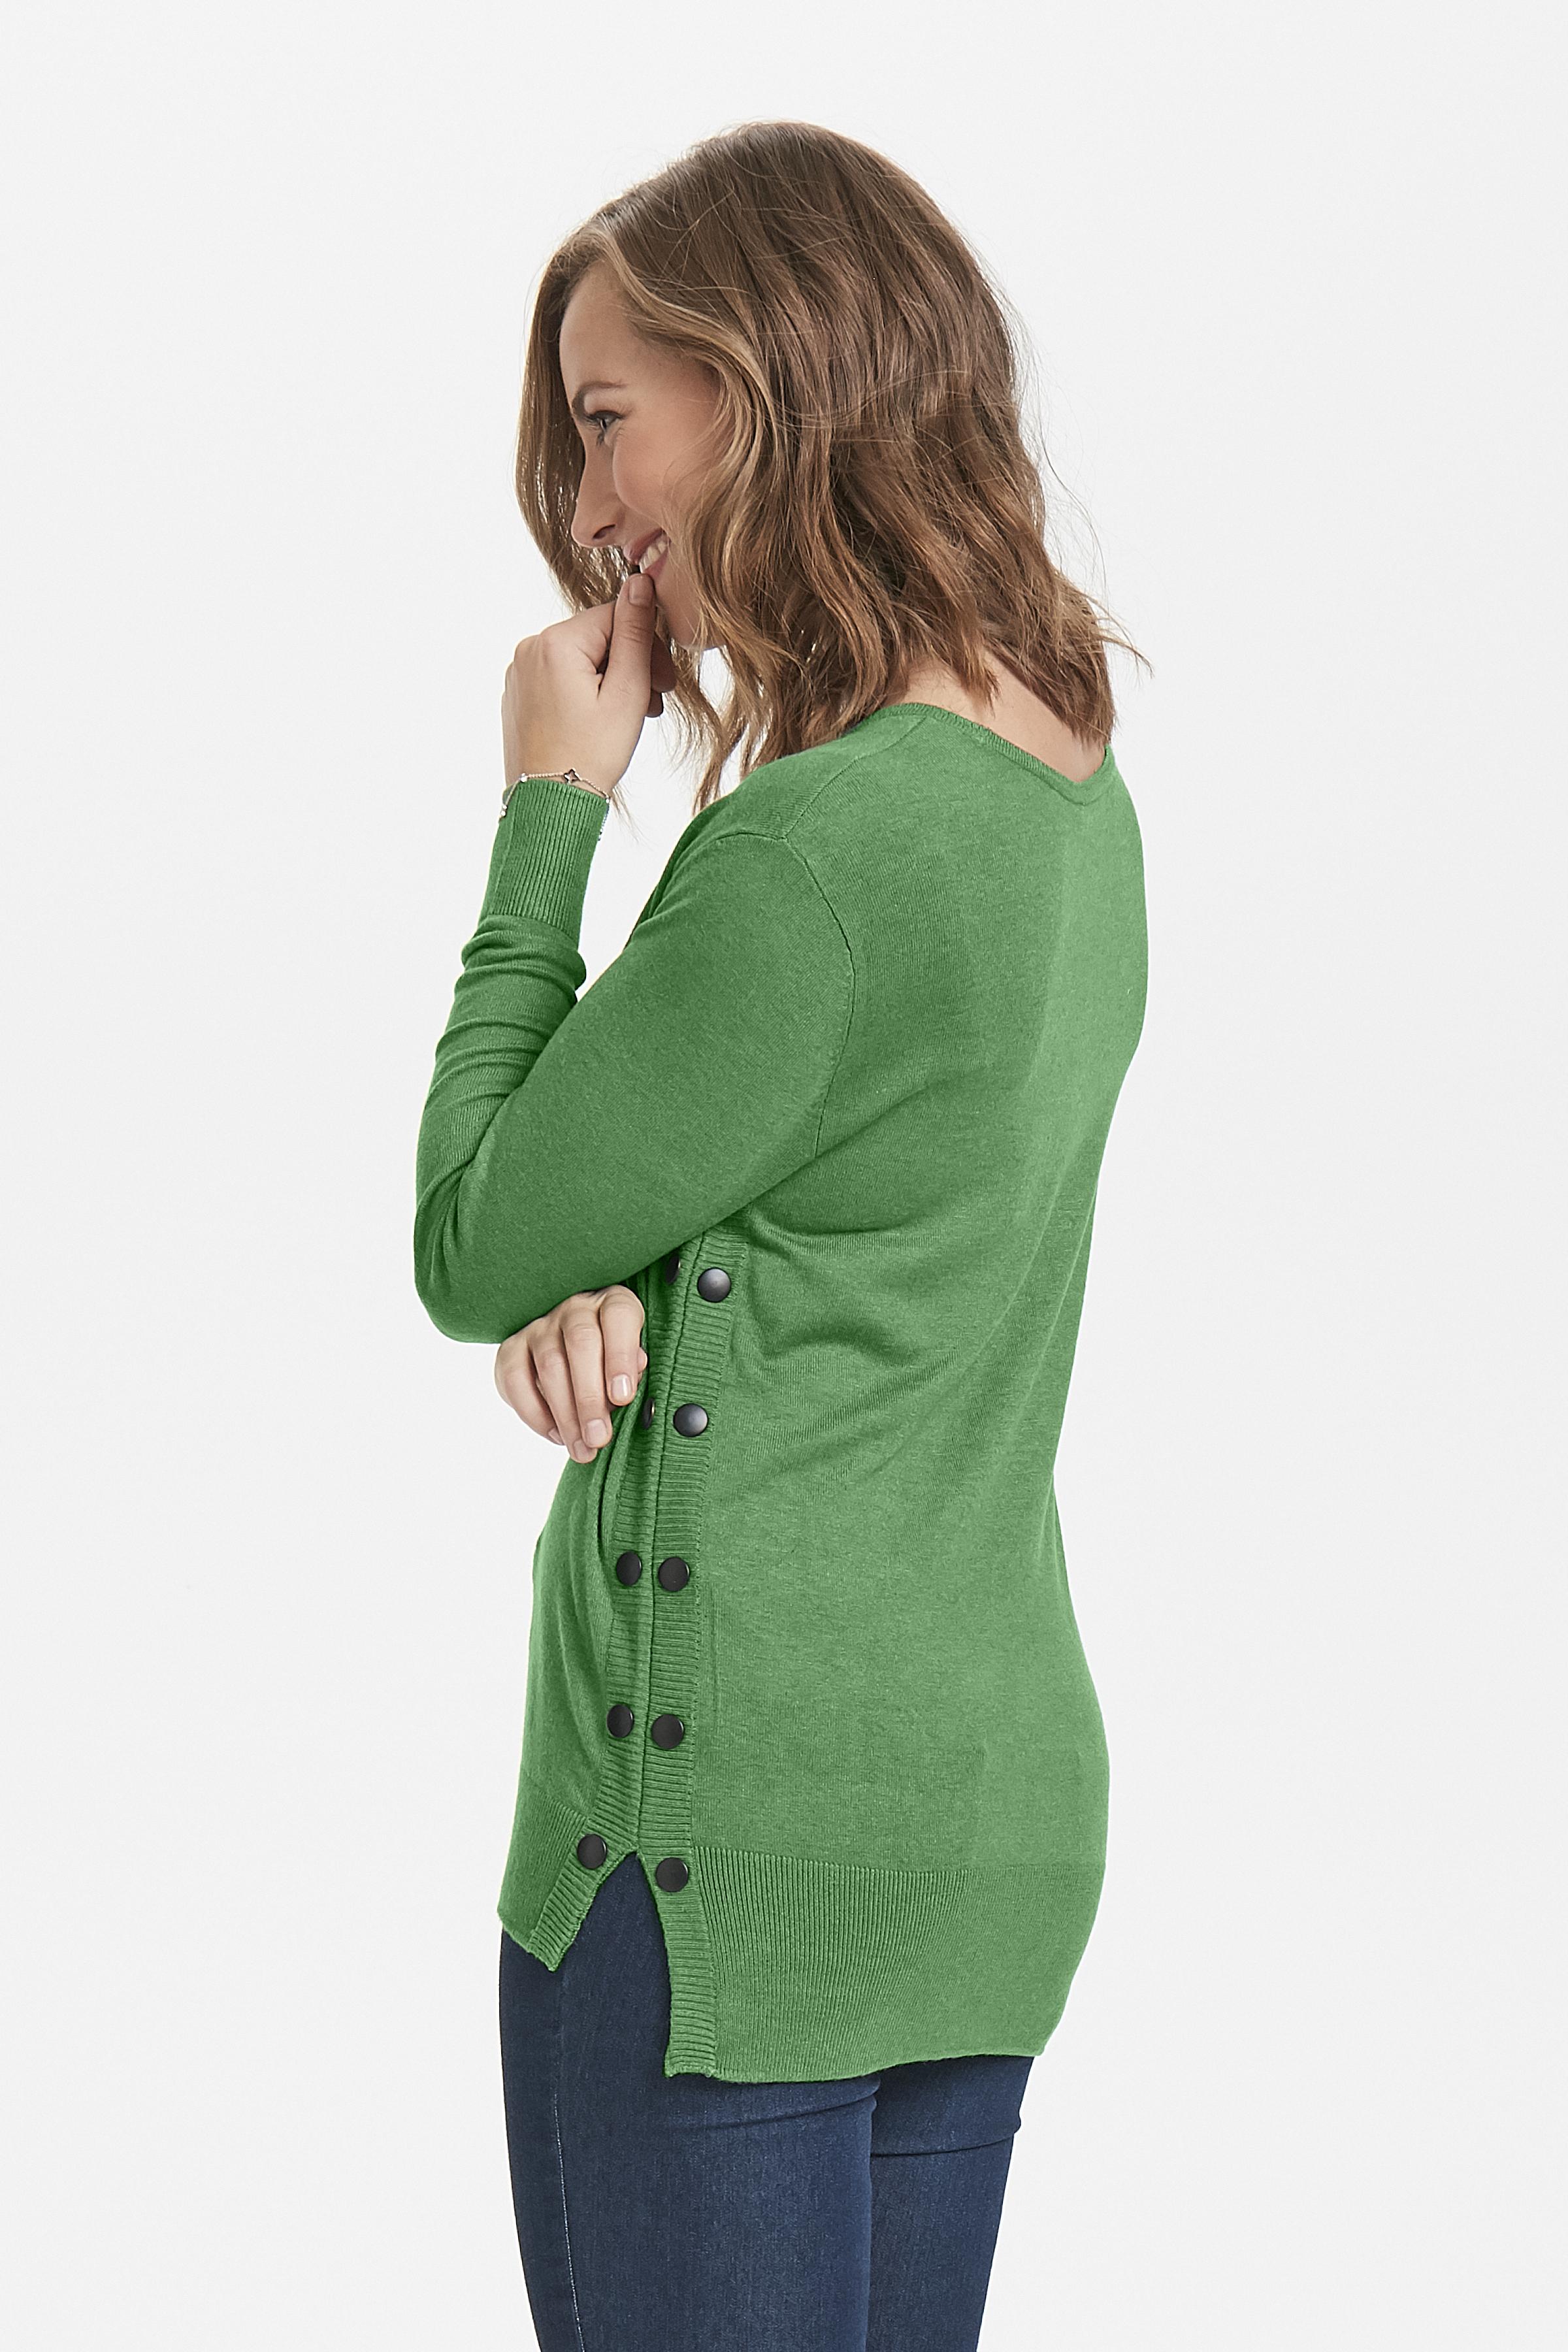 Grønmeleret Strikpullover fra Fransa – Køb Grønmeleret Strikpullover fra str. XS-XXL her